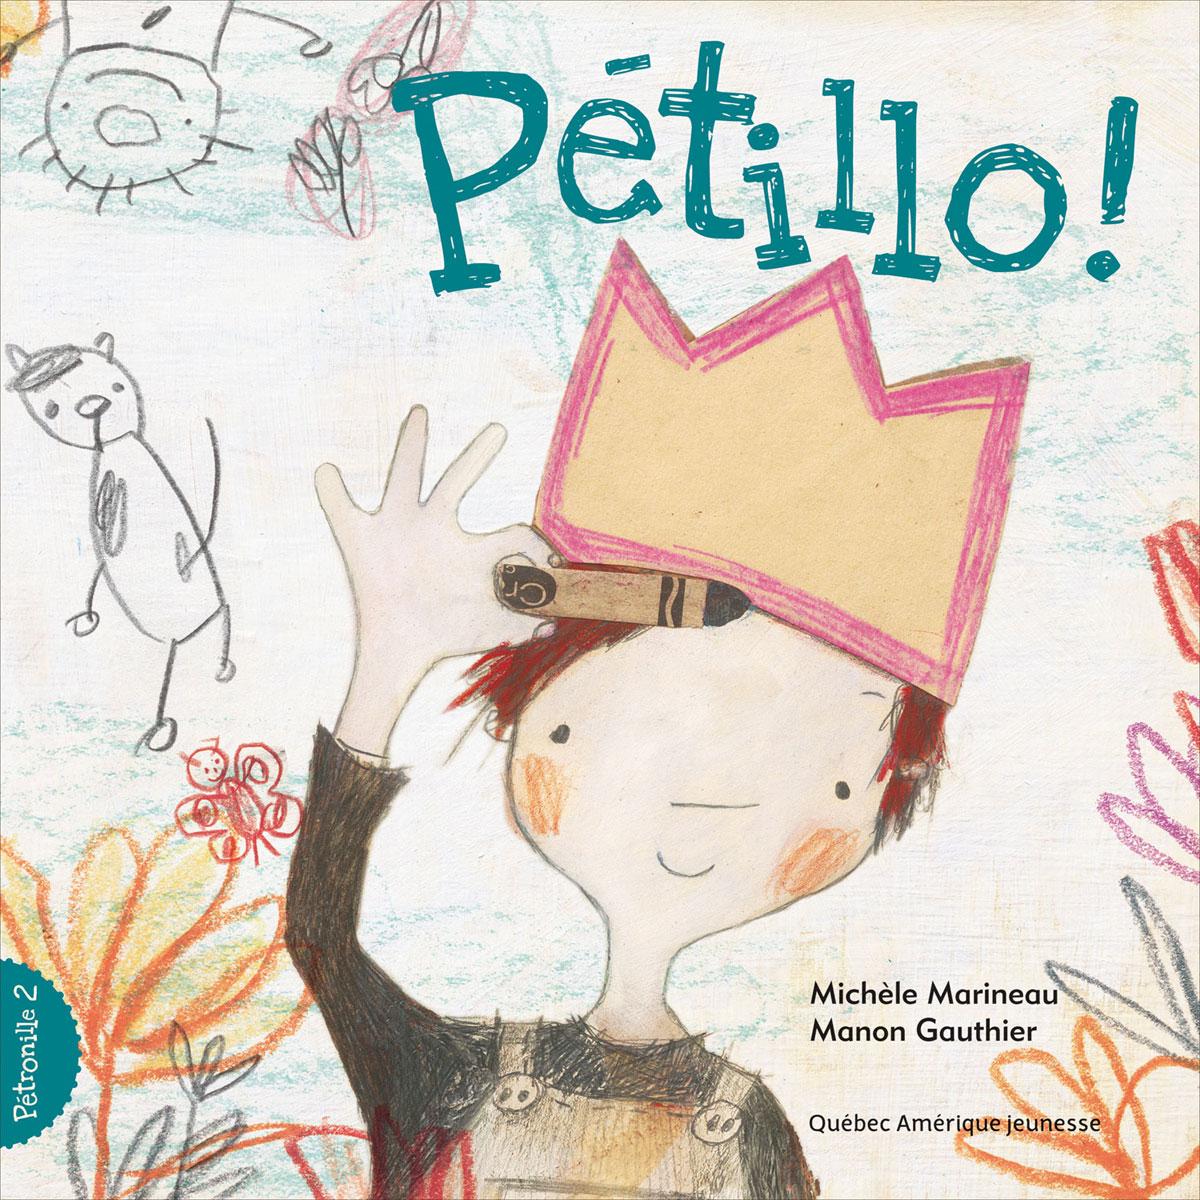 PETRONILLE 2 - PETILLO!